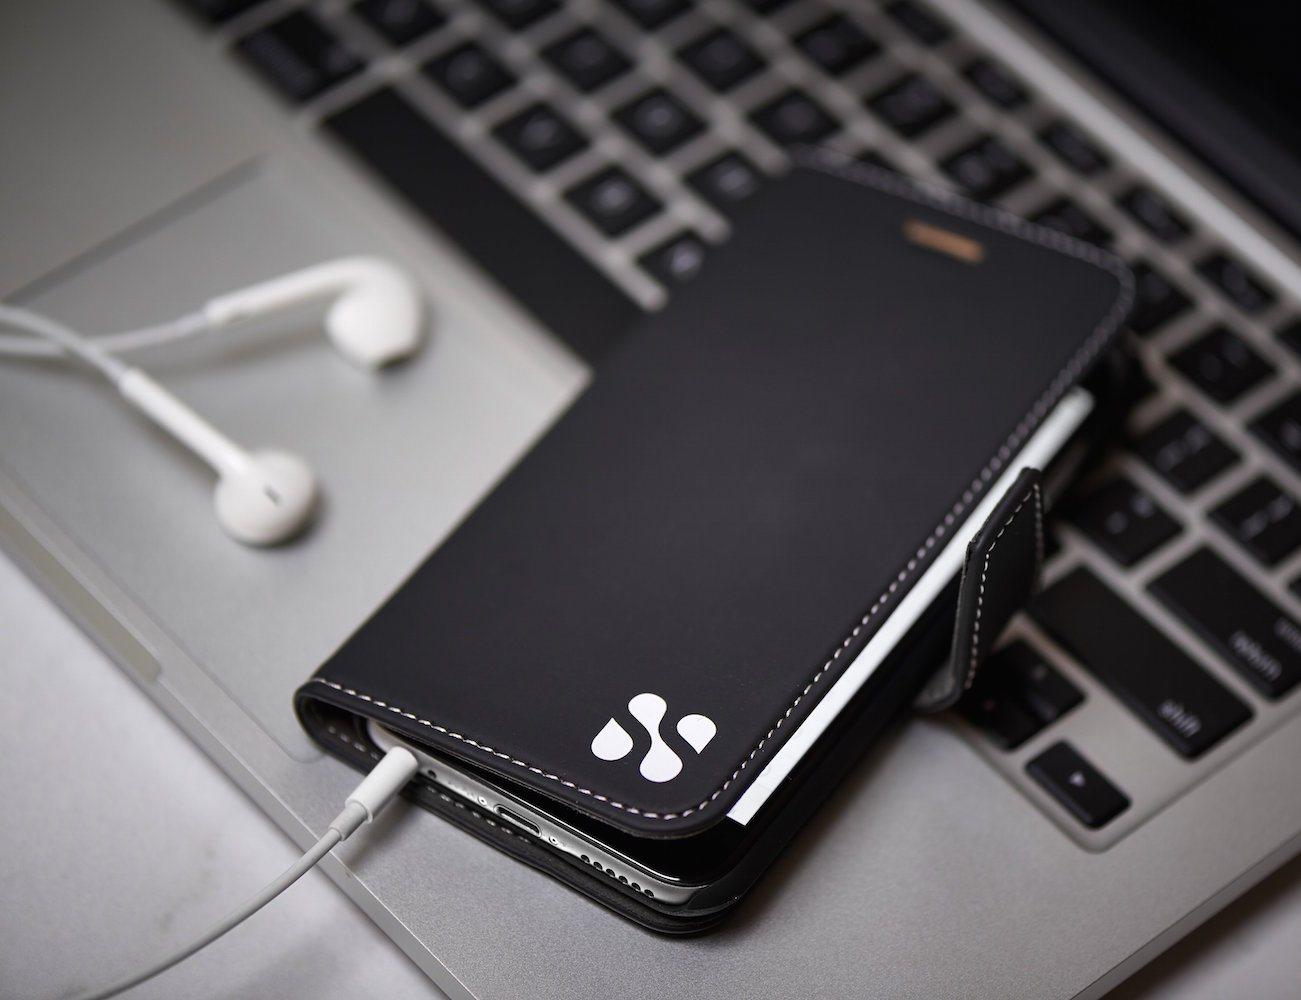 SafeSleeve+IPhone+6+%26amp%3B+Plus+Case+%26%238211%3B+Anti-Radiation+And+RFID+Blocking+Wallet